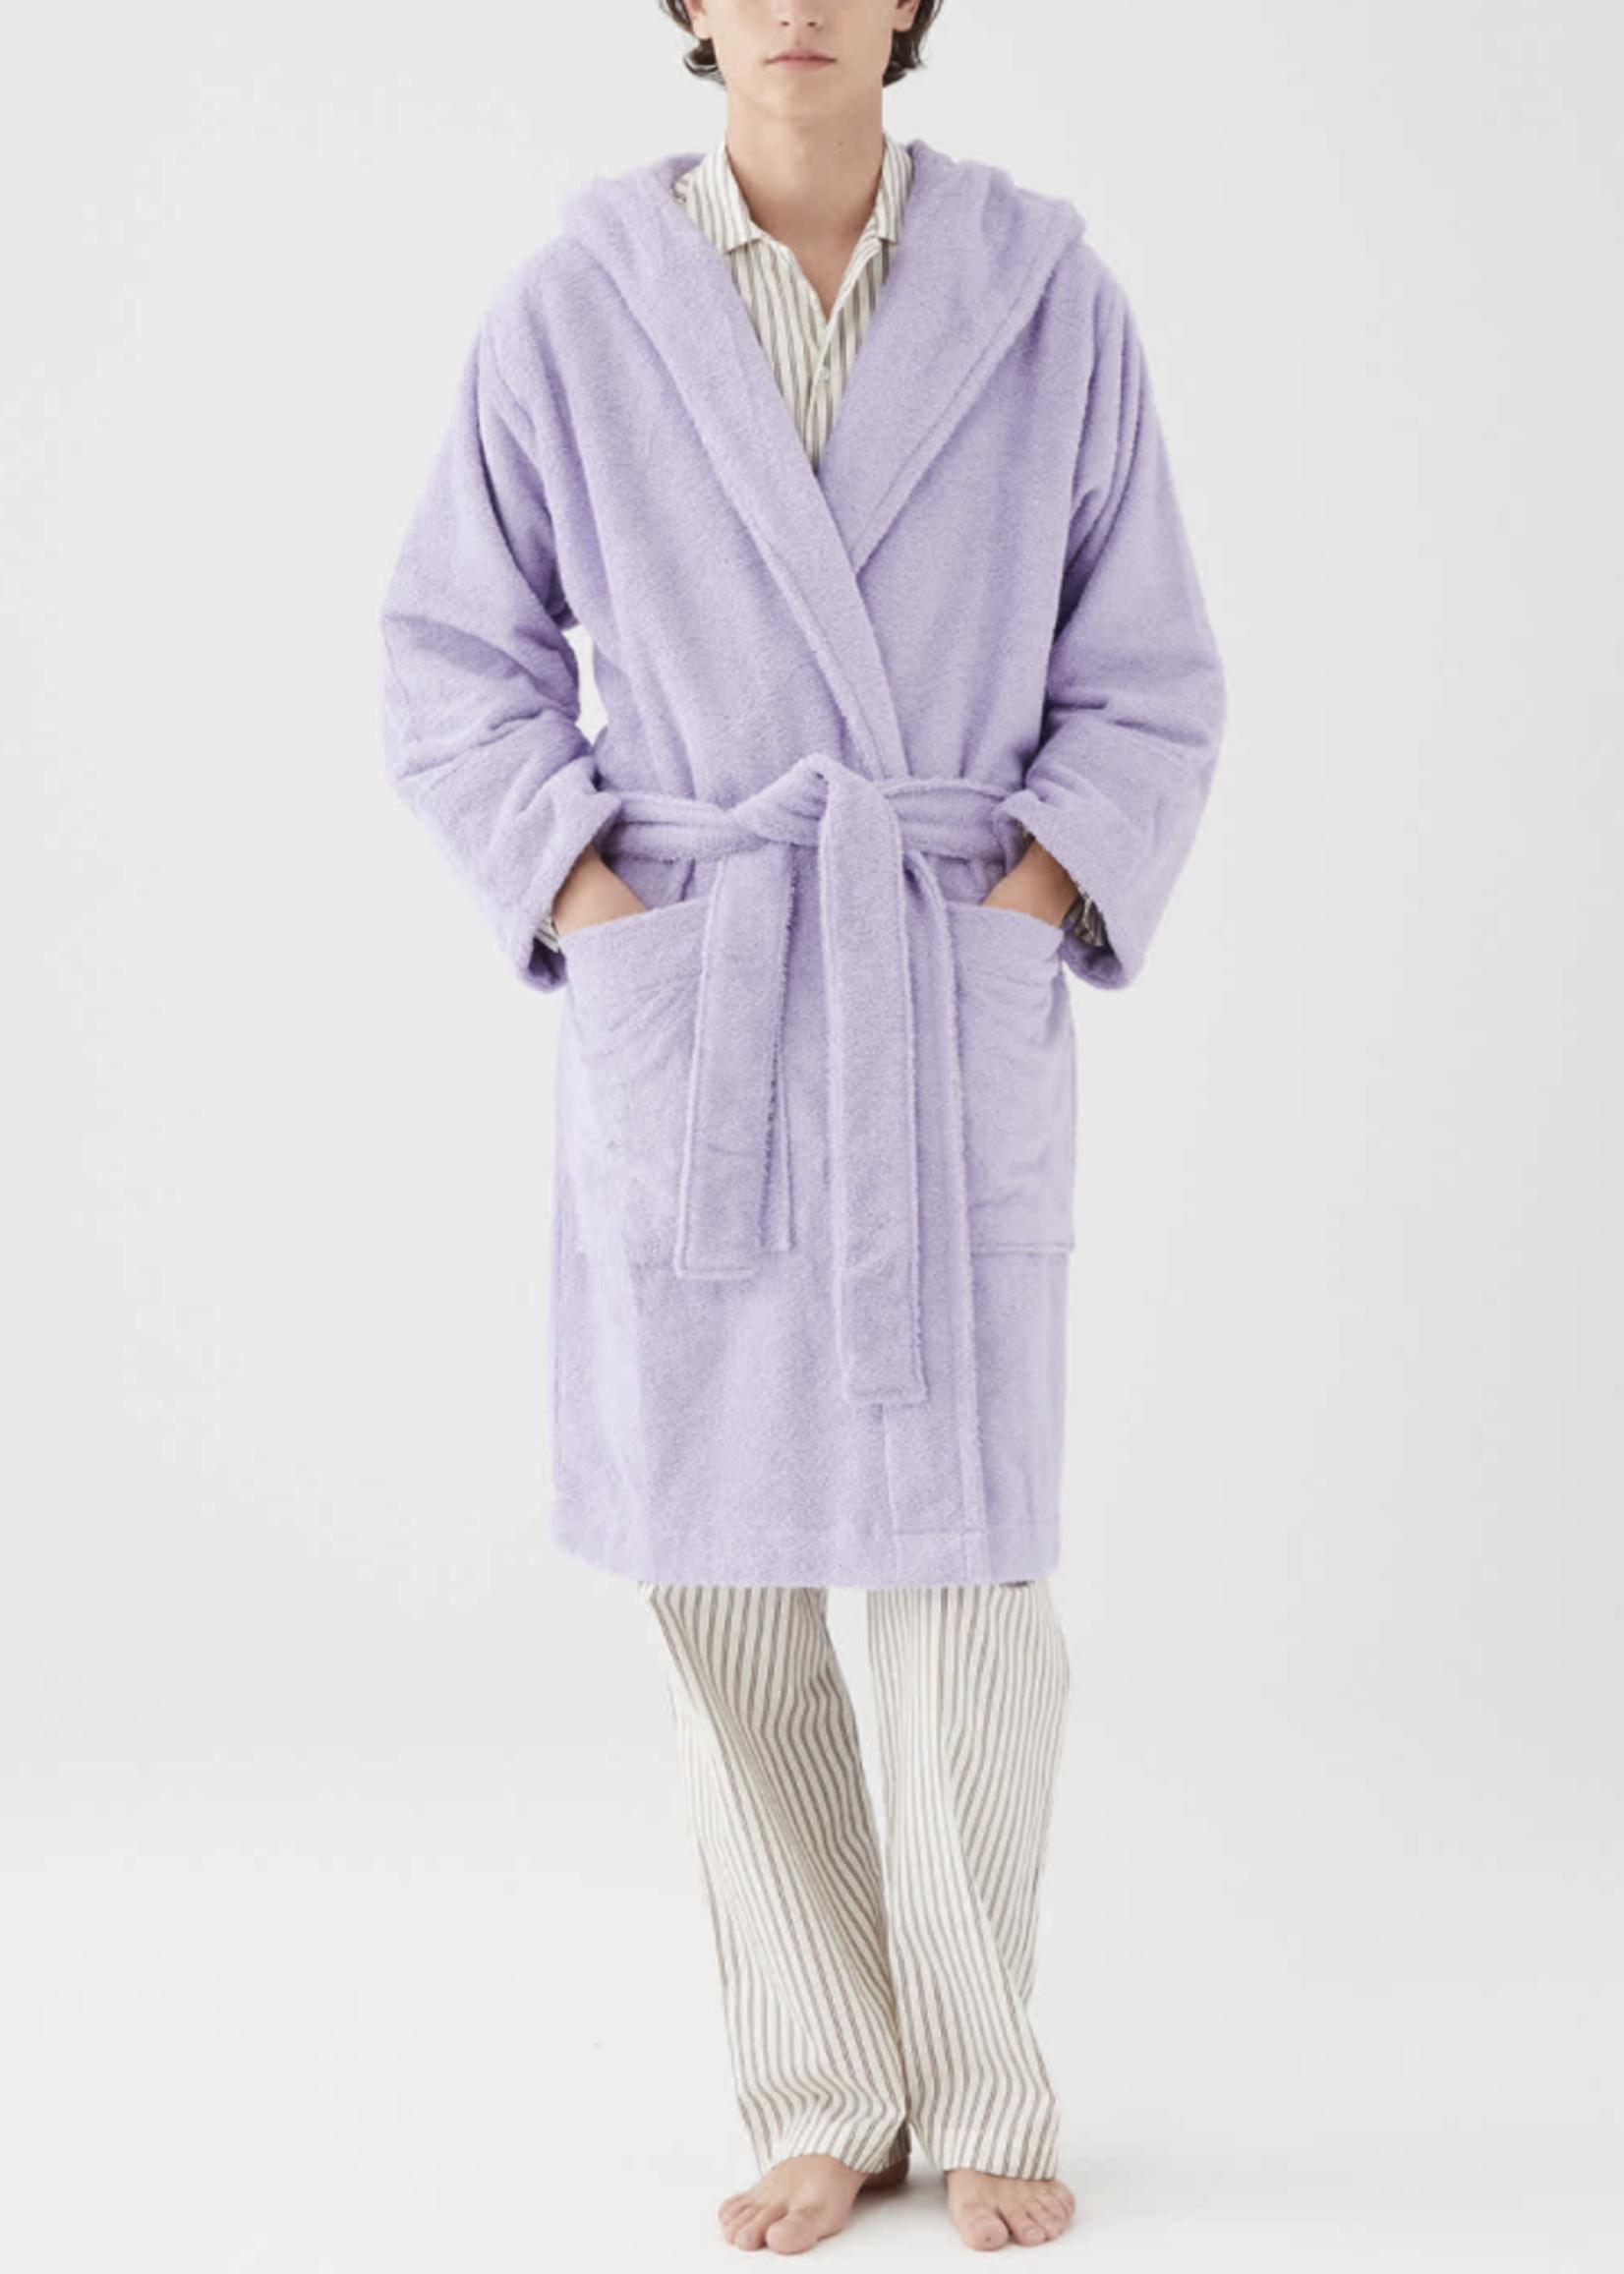 TEKLA Unisex Hooded Terry Bathrobe in Lavender